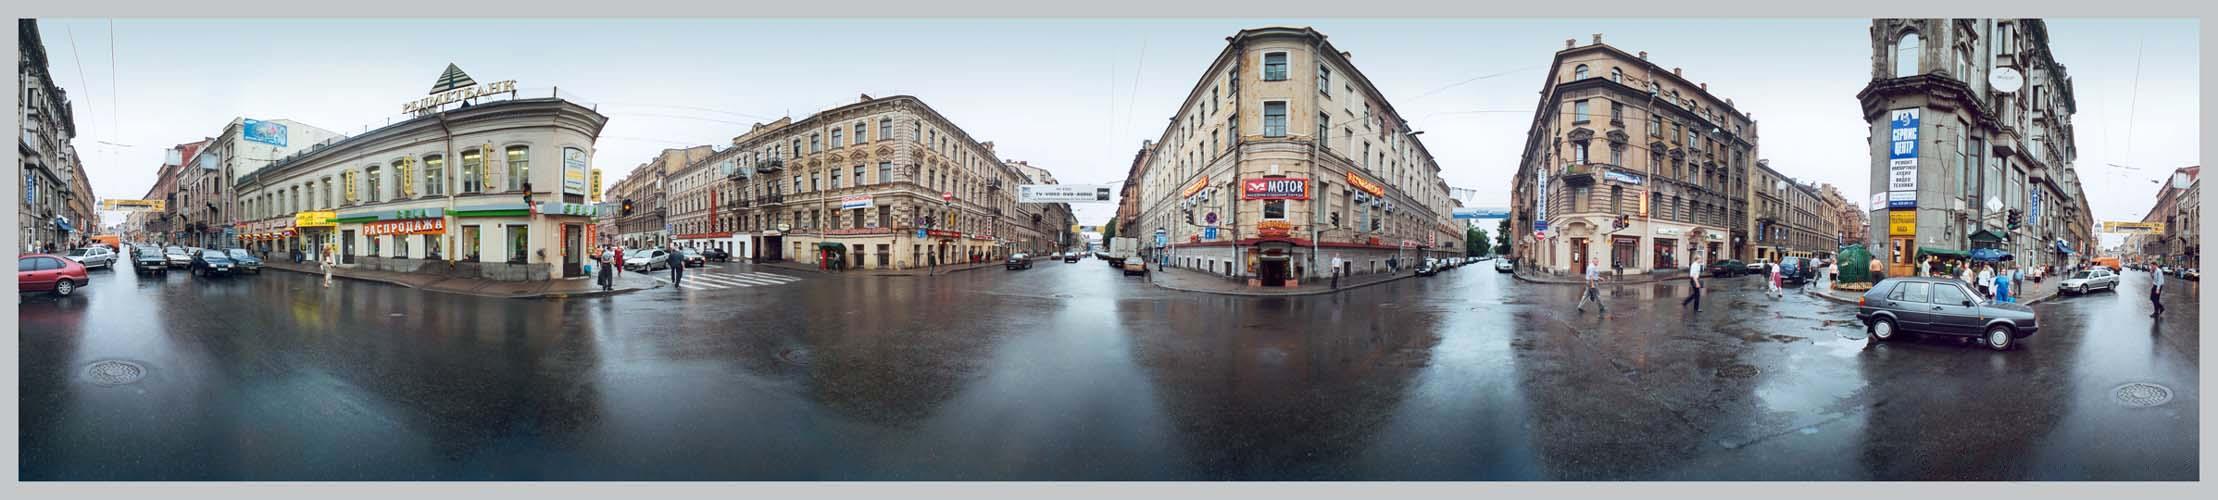 Санкт-петербург 5 углов фото